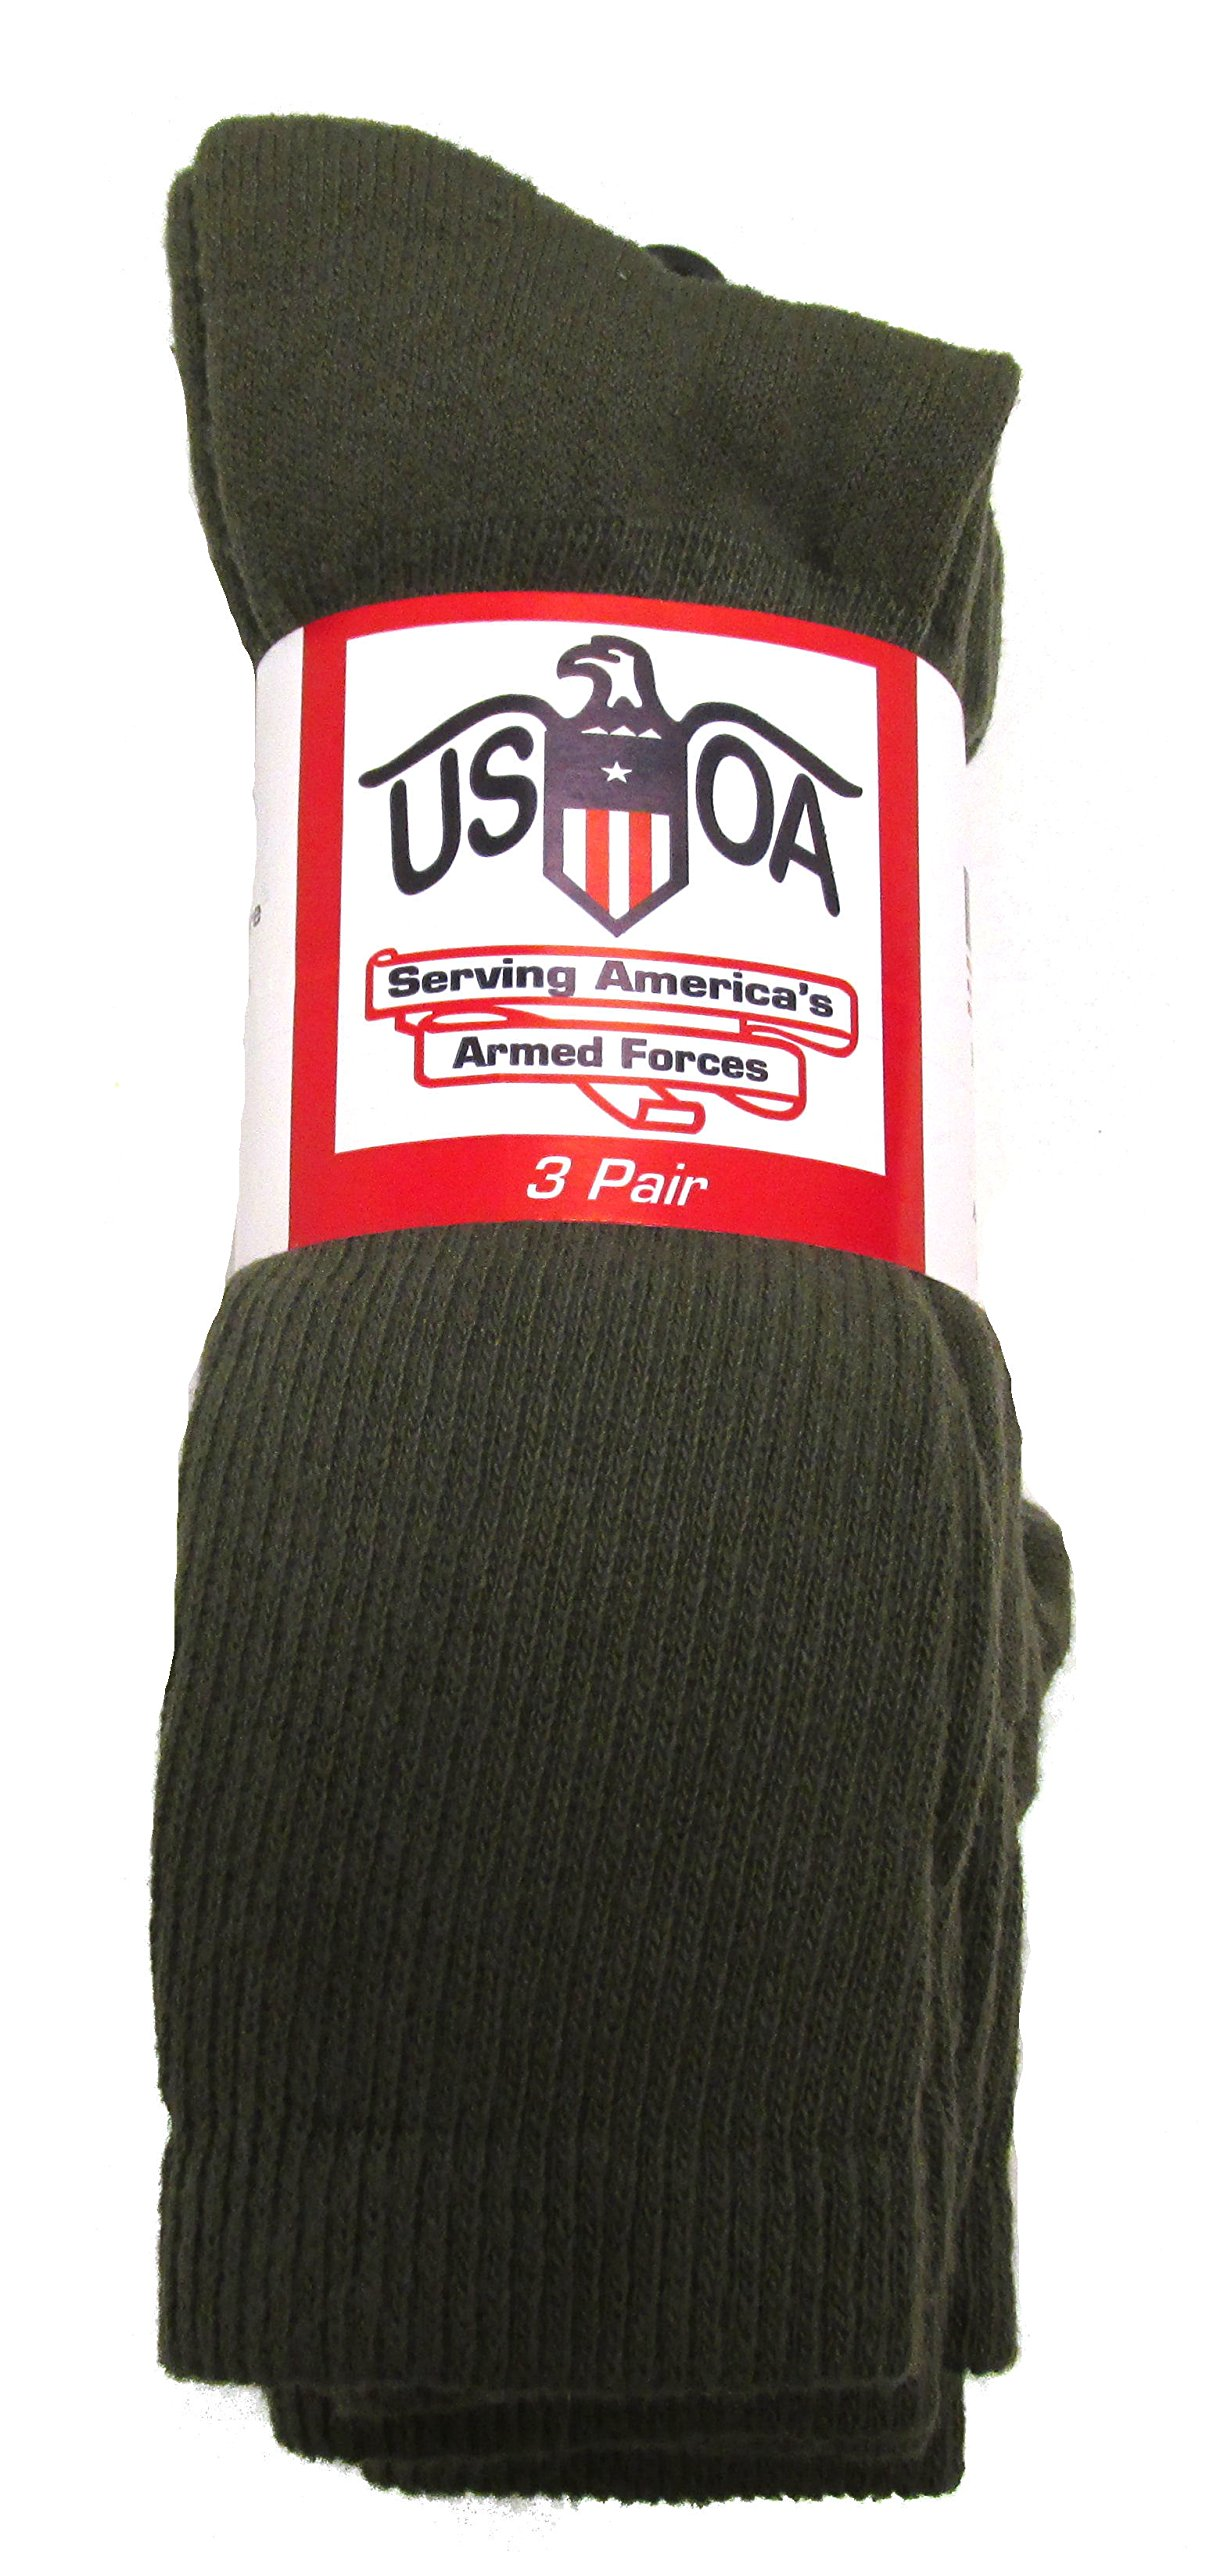 Men's Military Boot Socks OLIVE DRAB - 3 PAIR - LARGE by USOA